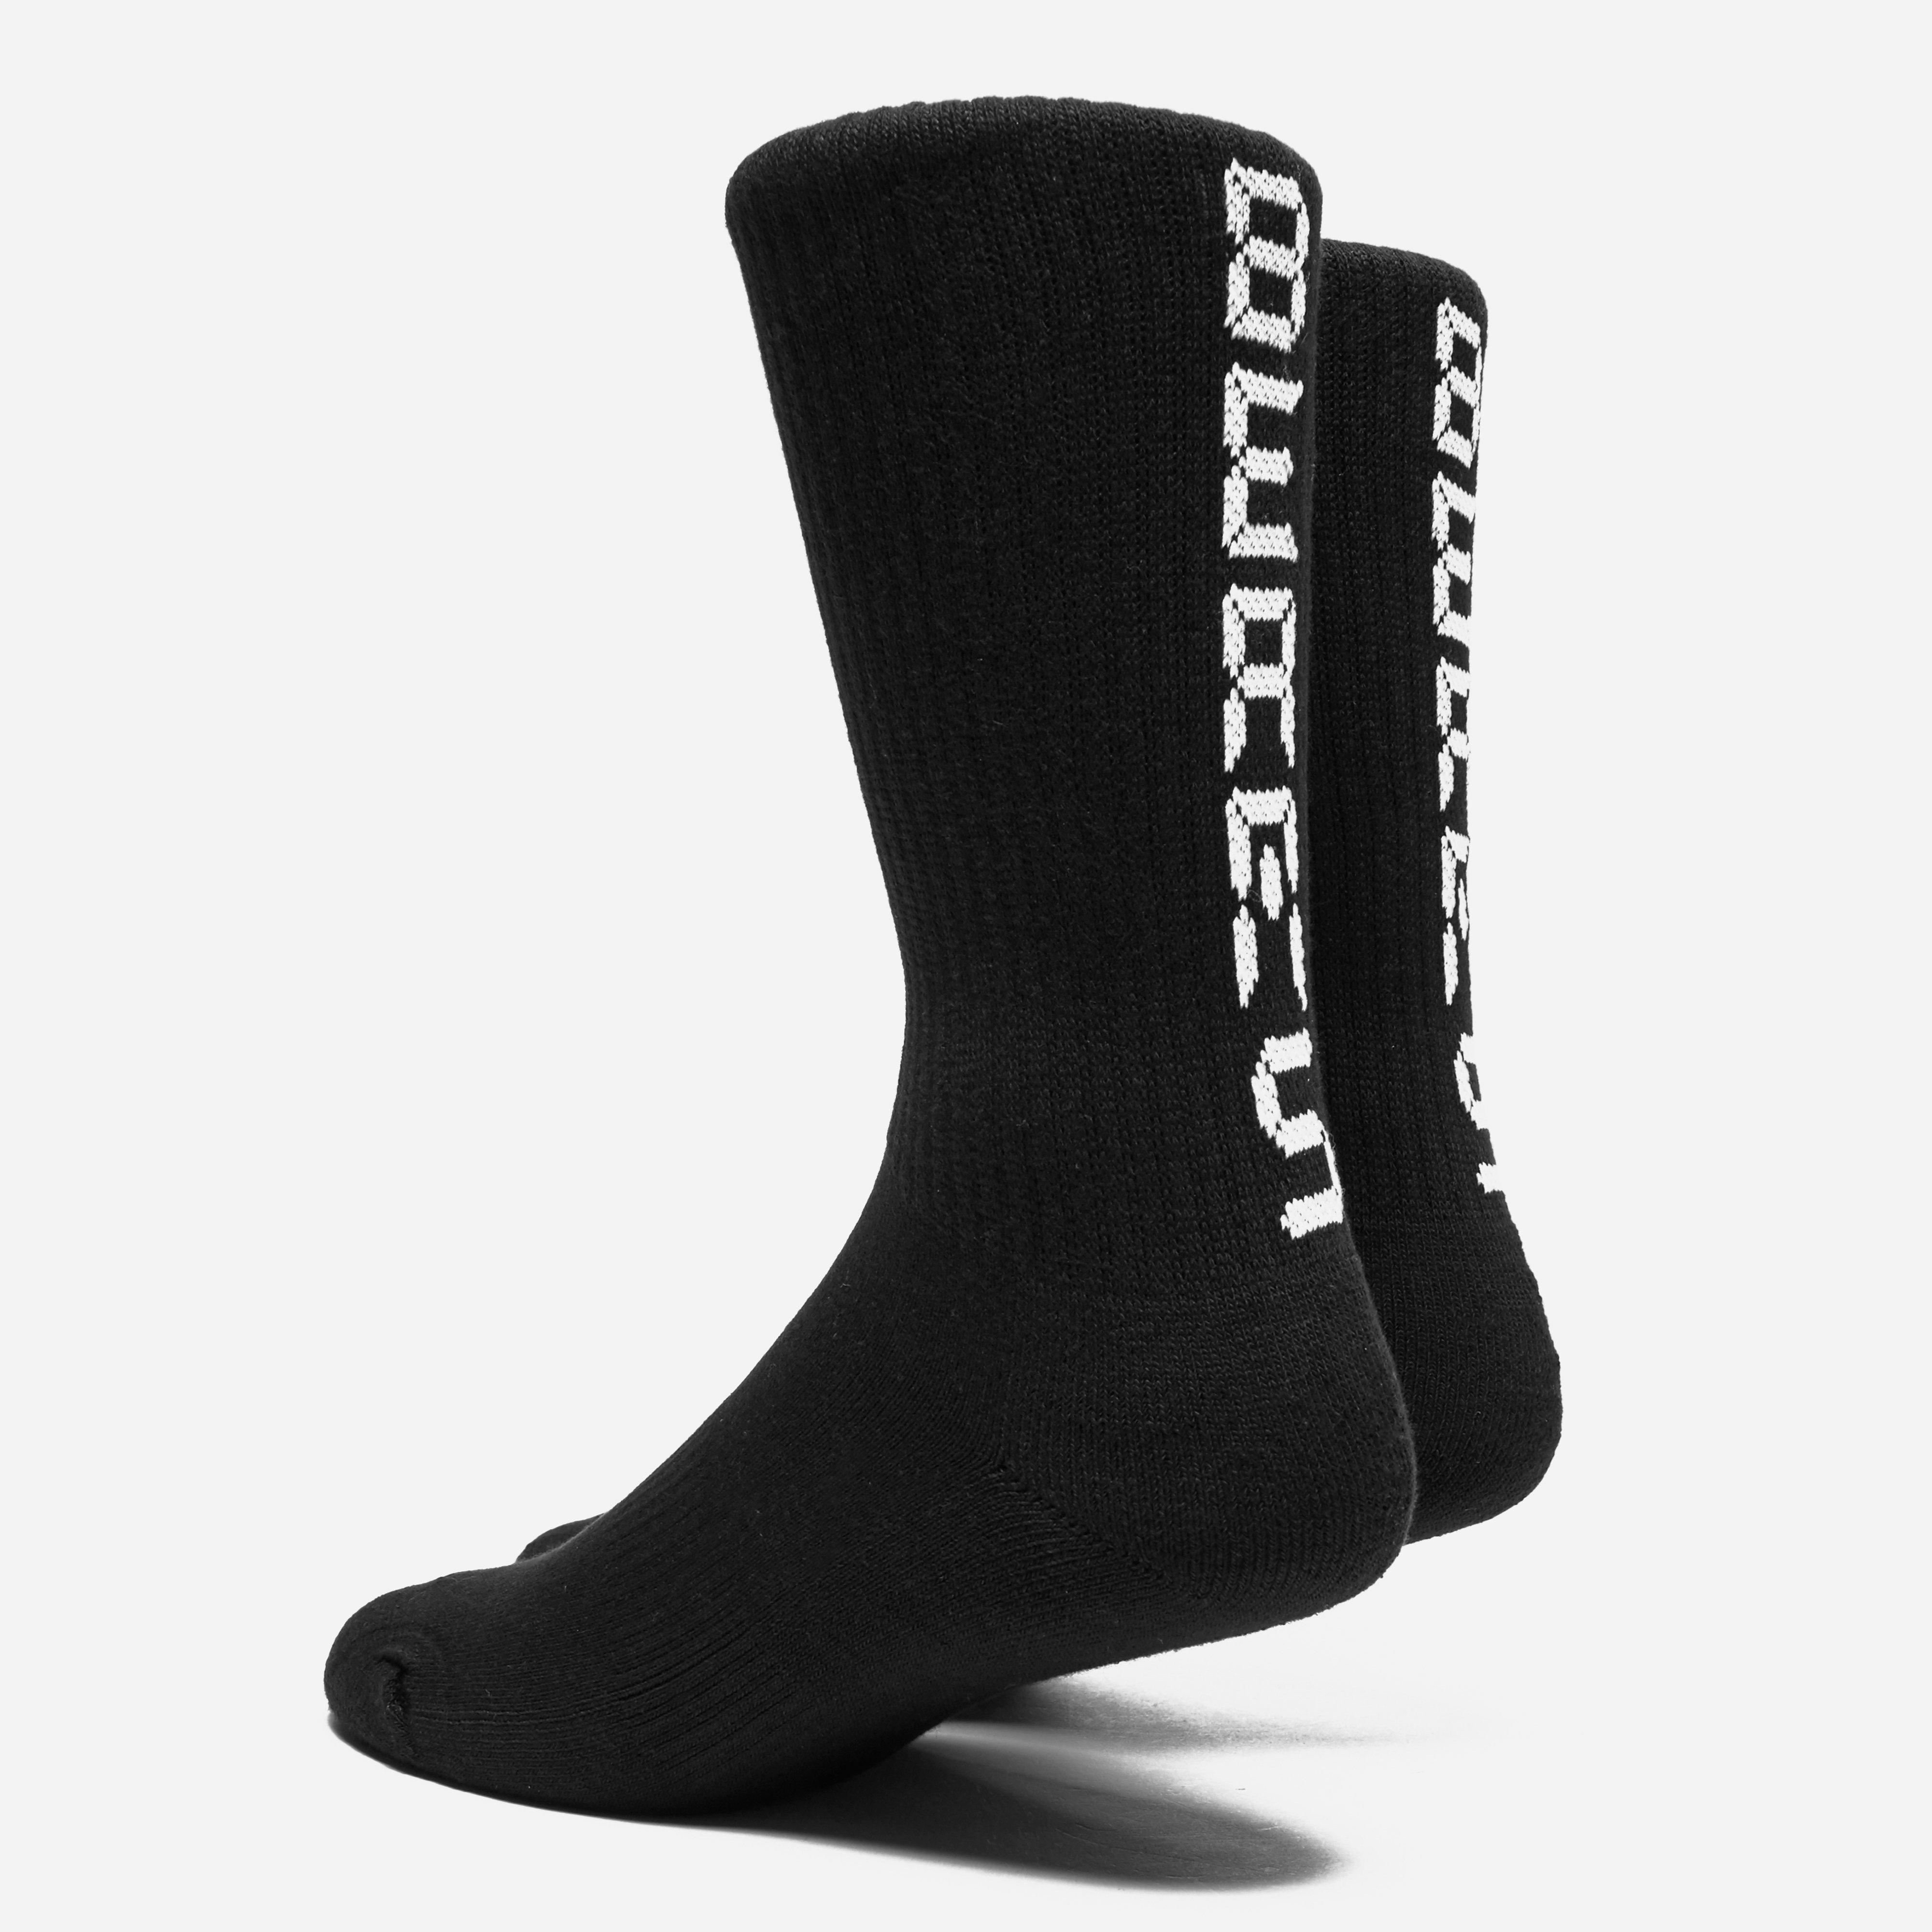 Champion x BEAMS 2 Pack Socks